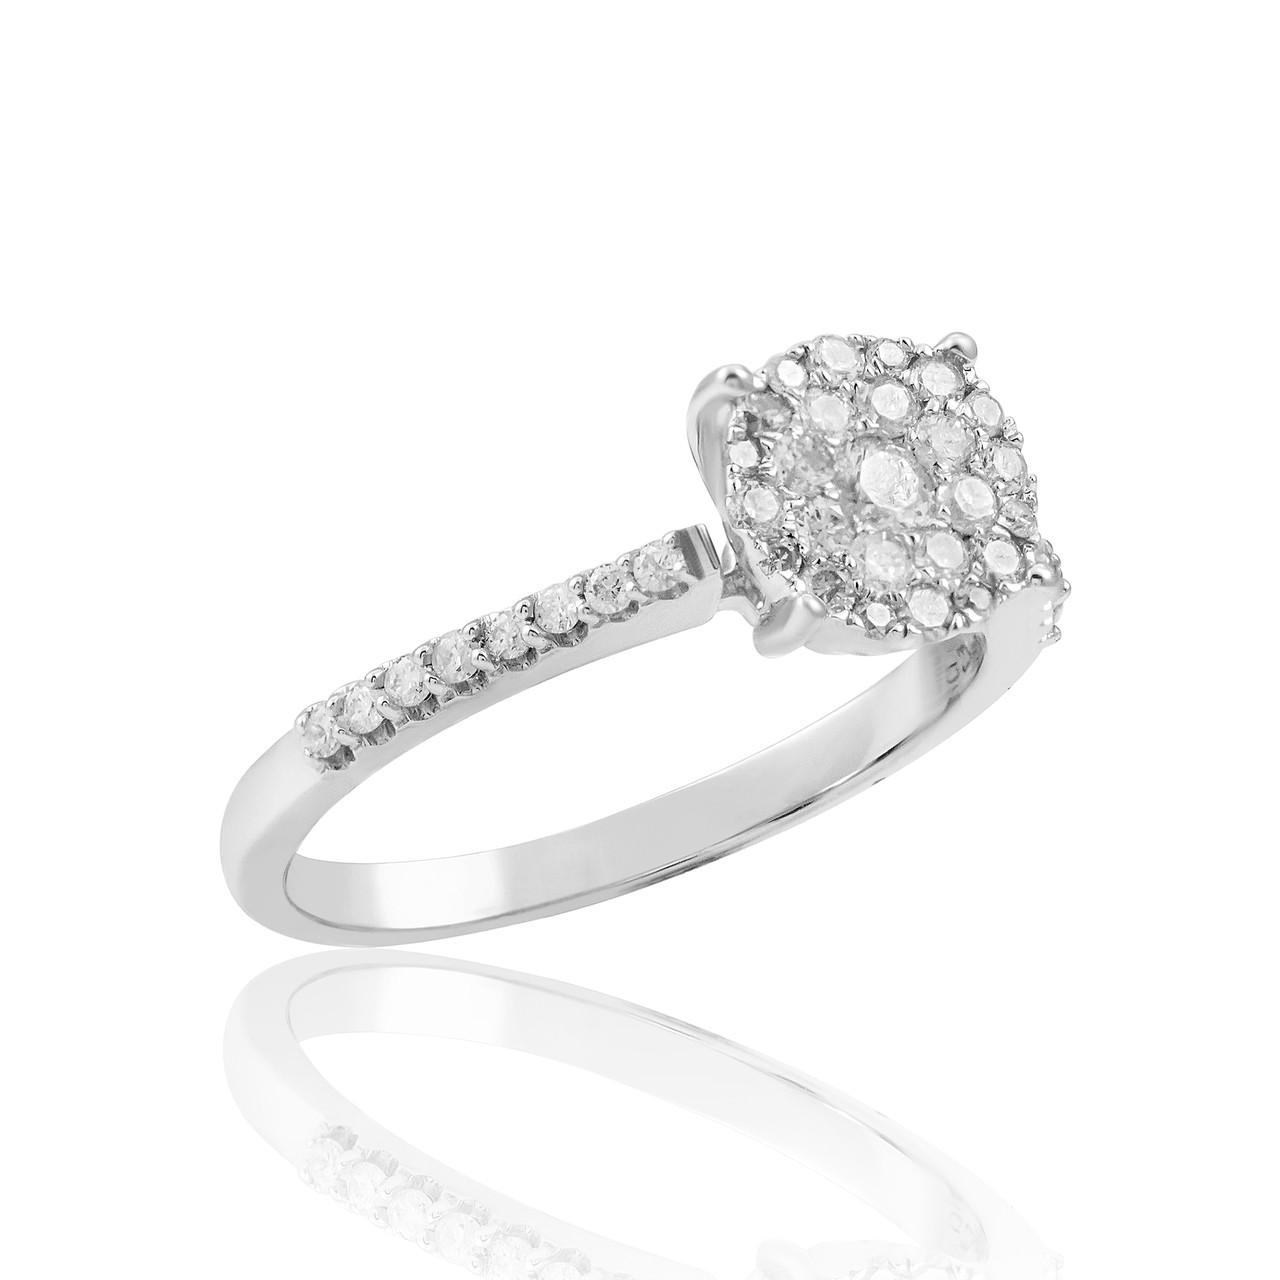 10k white gold 50ct engagement ring shyne jewelers. Black Bedroom Furniture Sets. Home Design Ideas